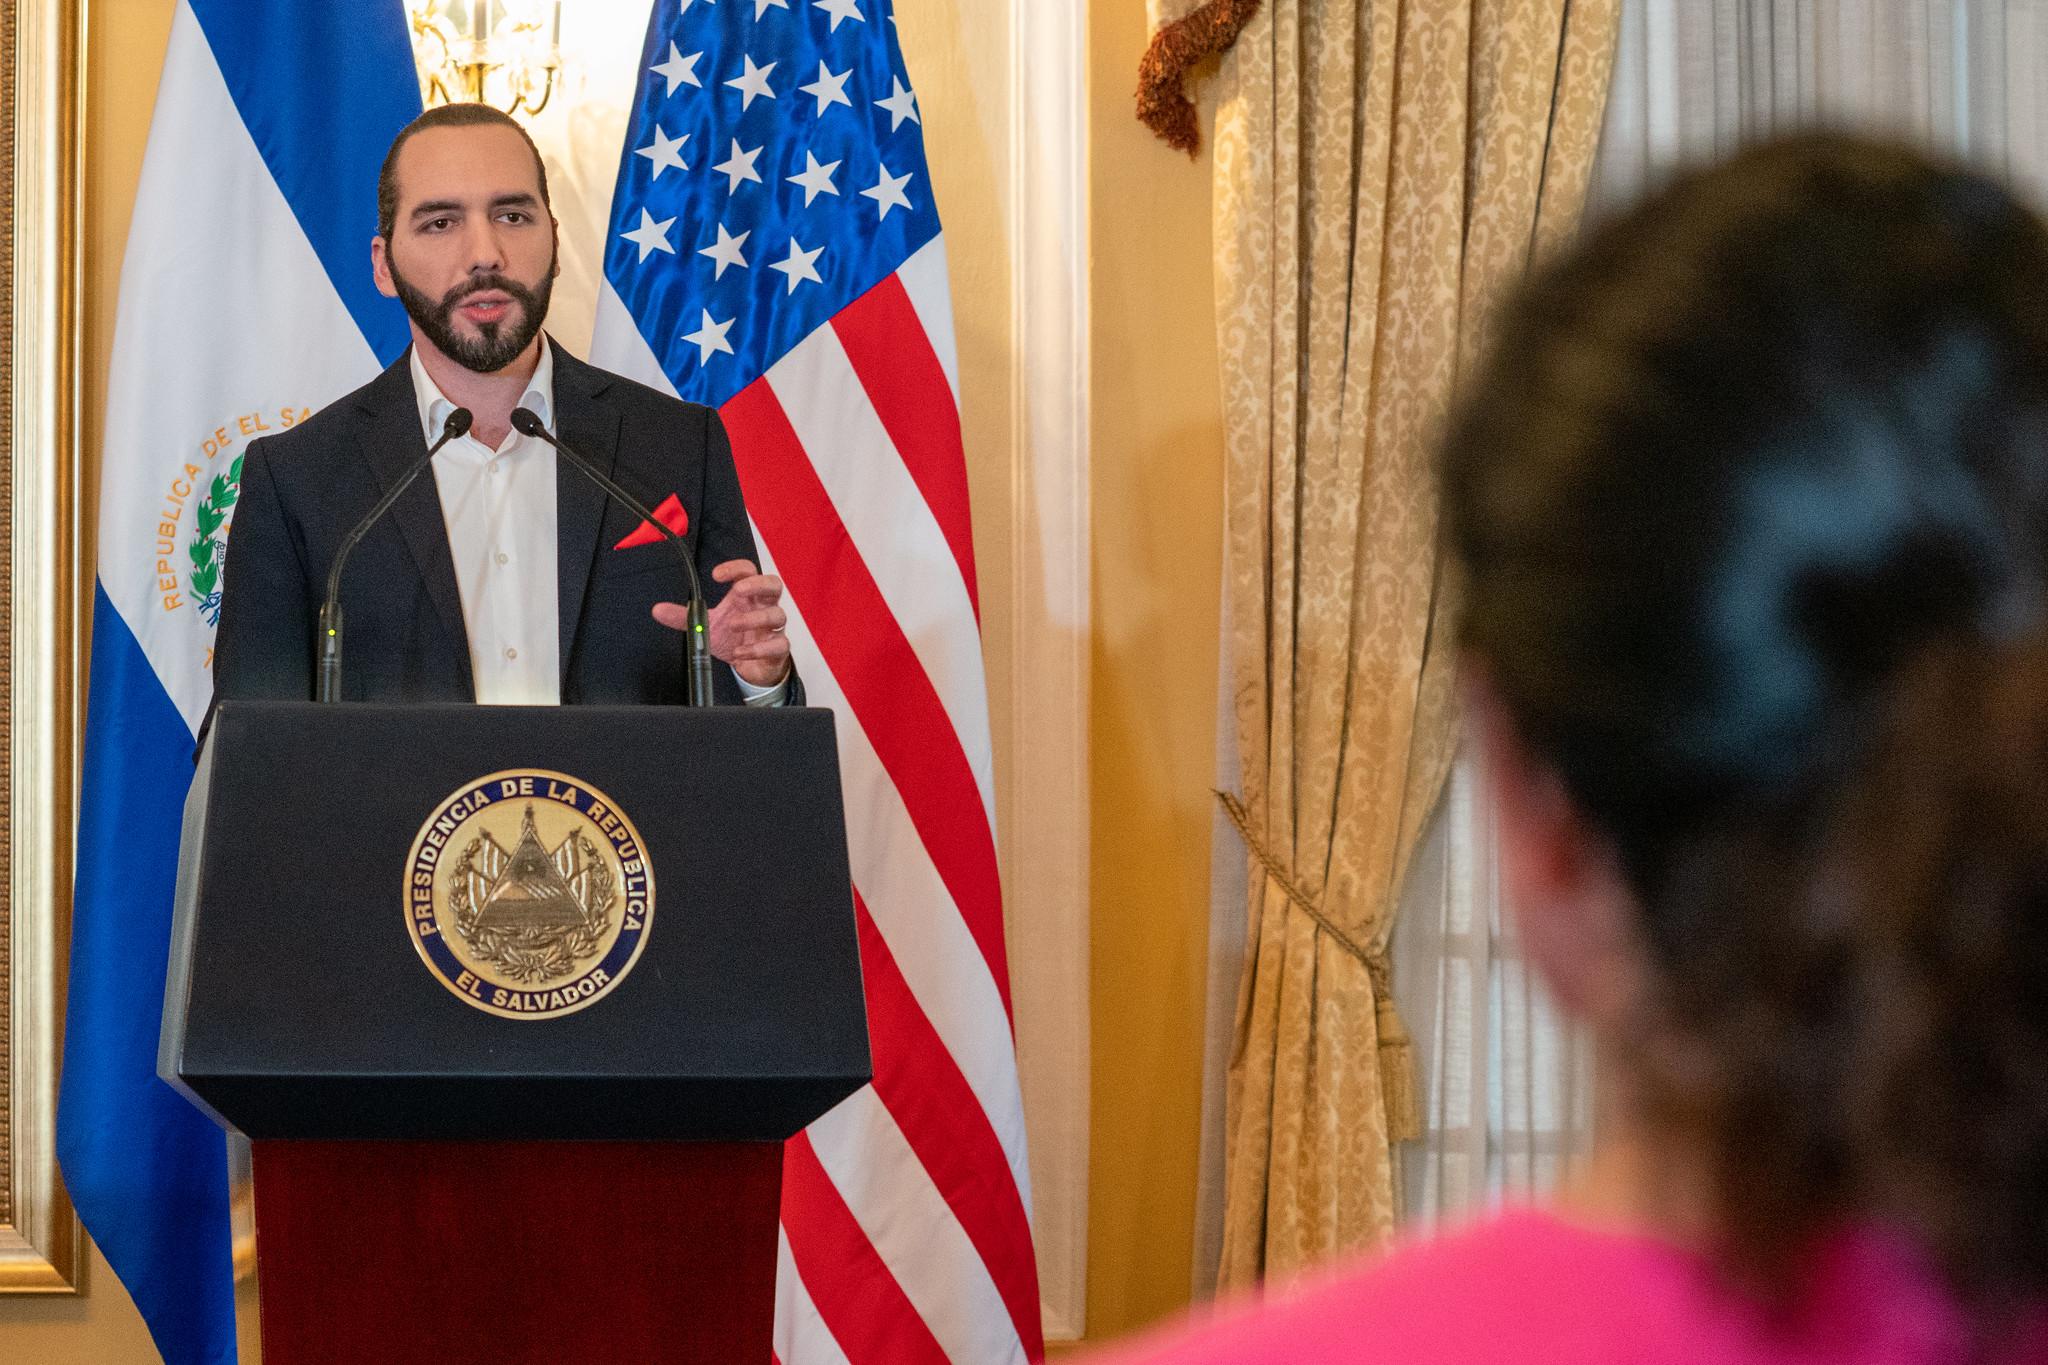 Senior El Salvador Official Resigns Amid Cover-Up Allegations